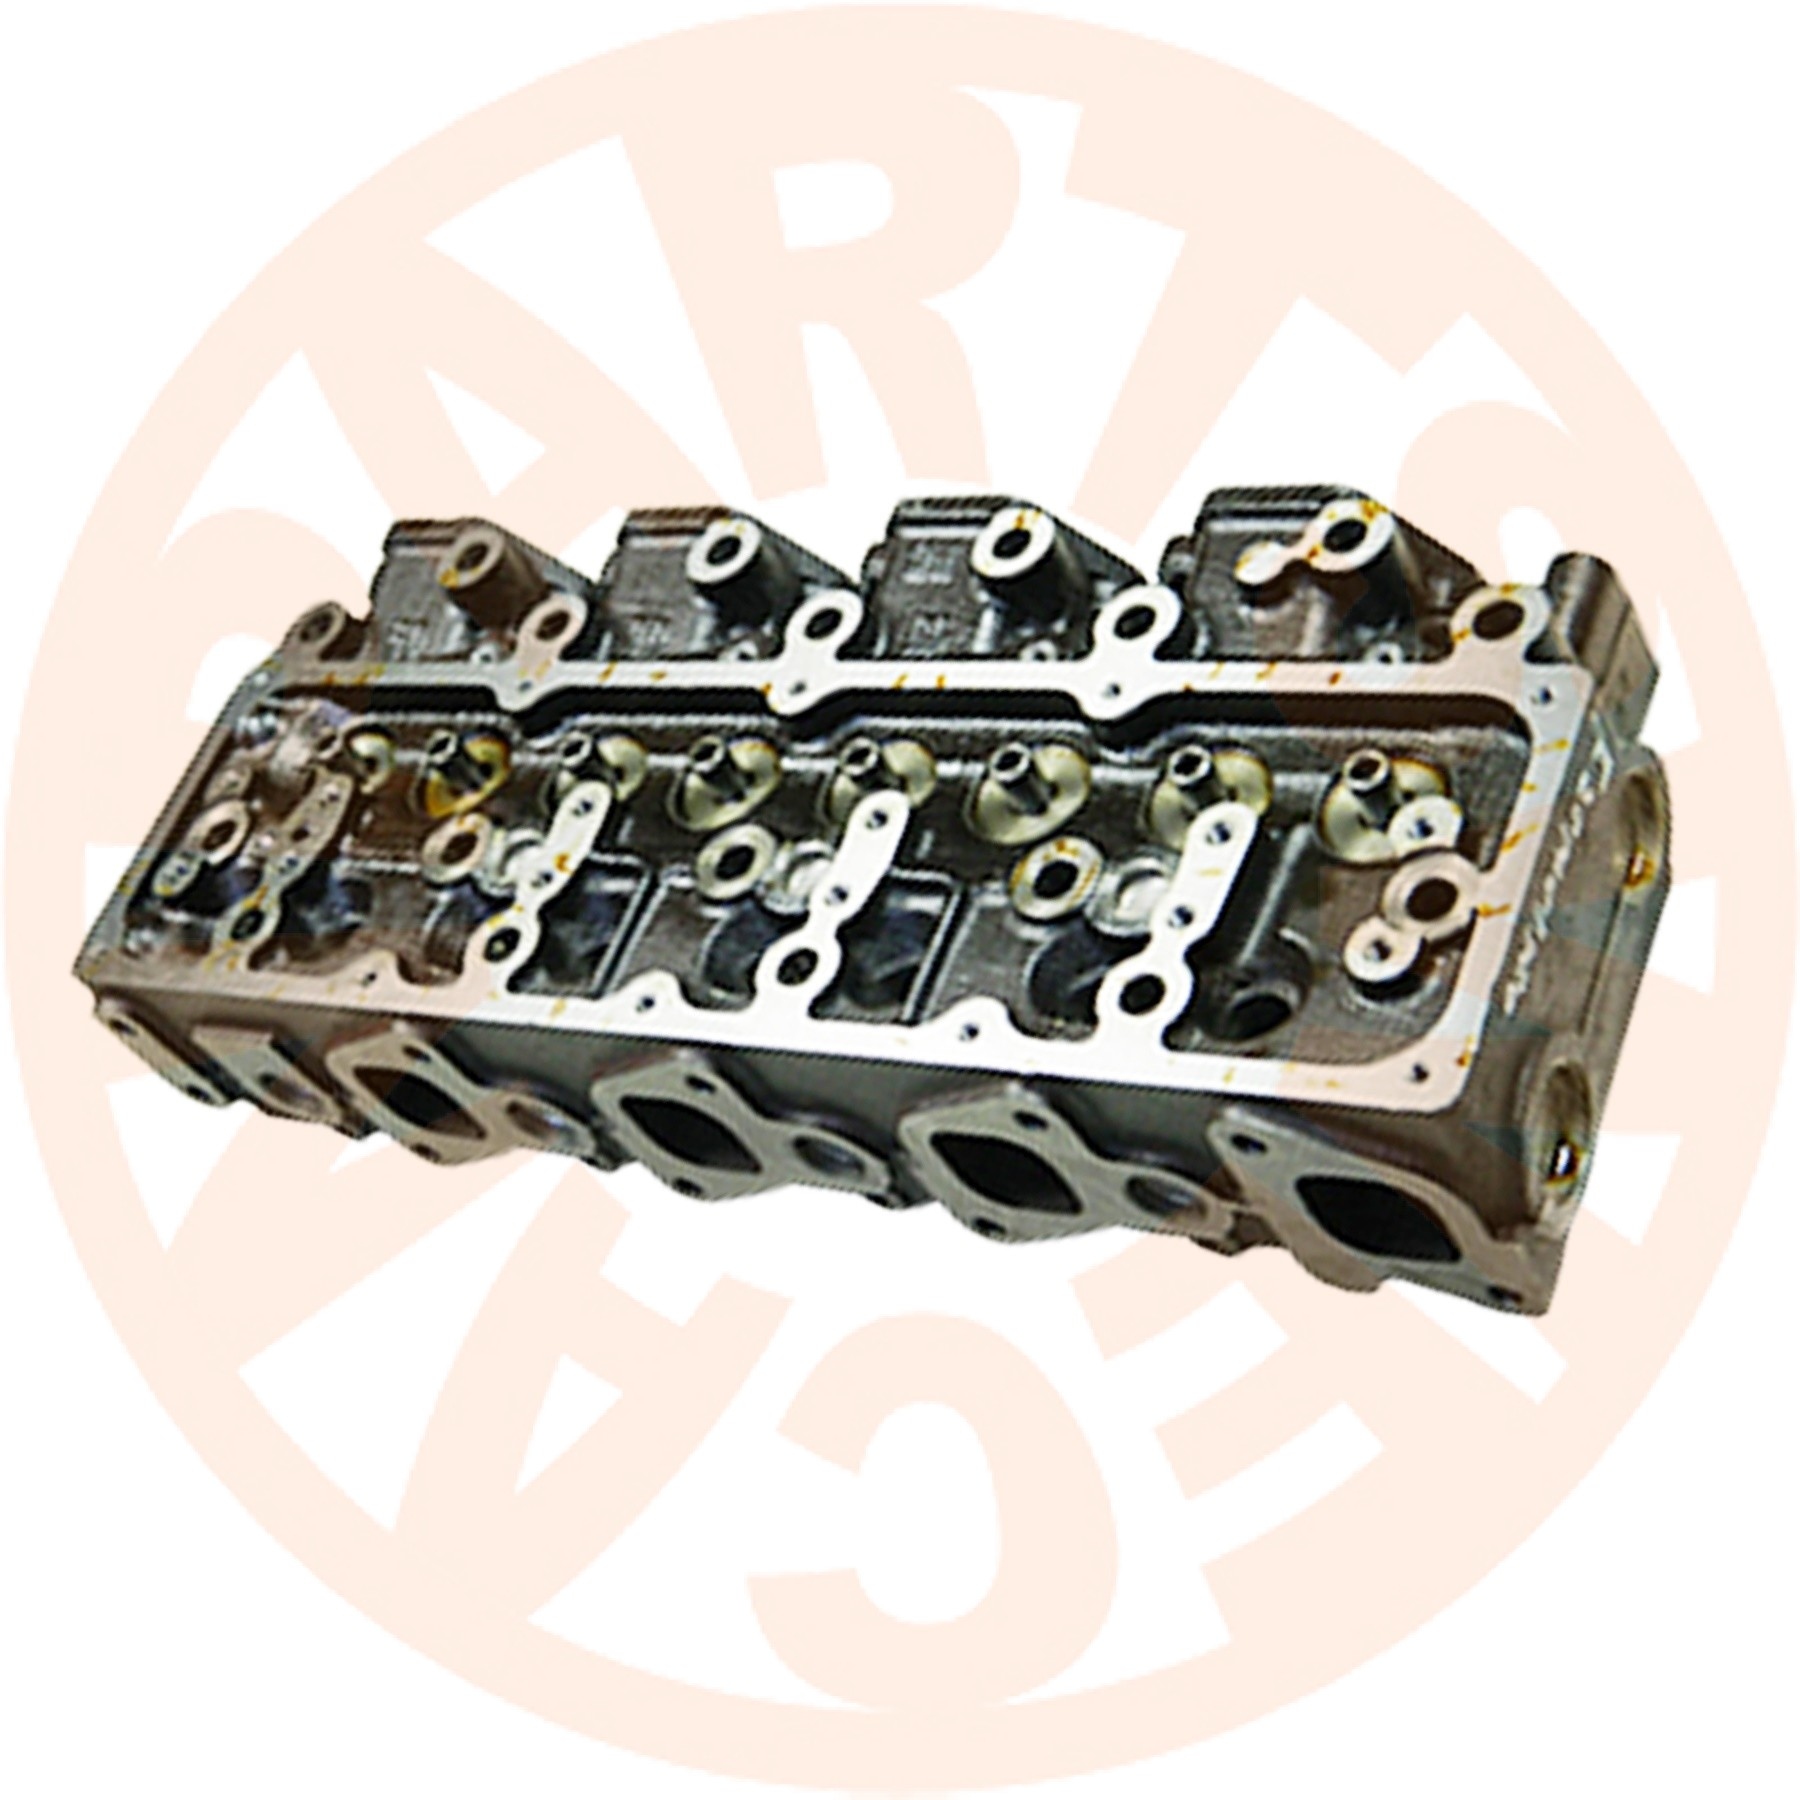 Nissan Qd32 Wiring Diagram Library Cylinder Head Engine Forklift Aftermarket Parts 11039 Vh002